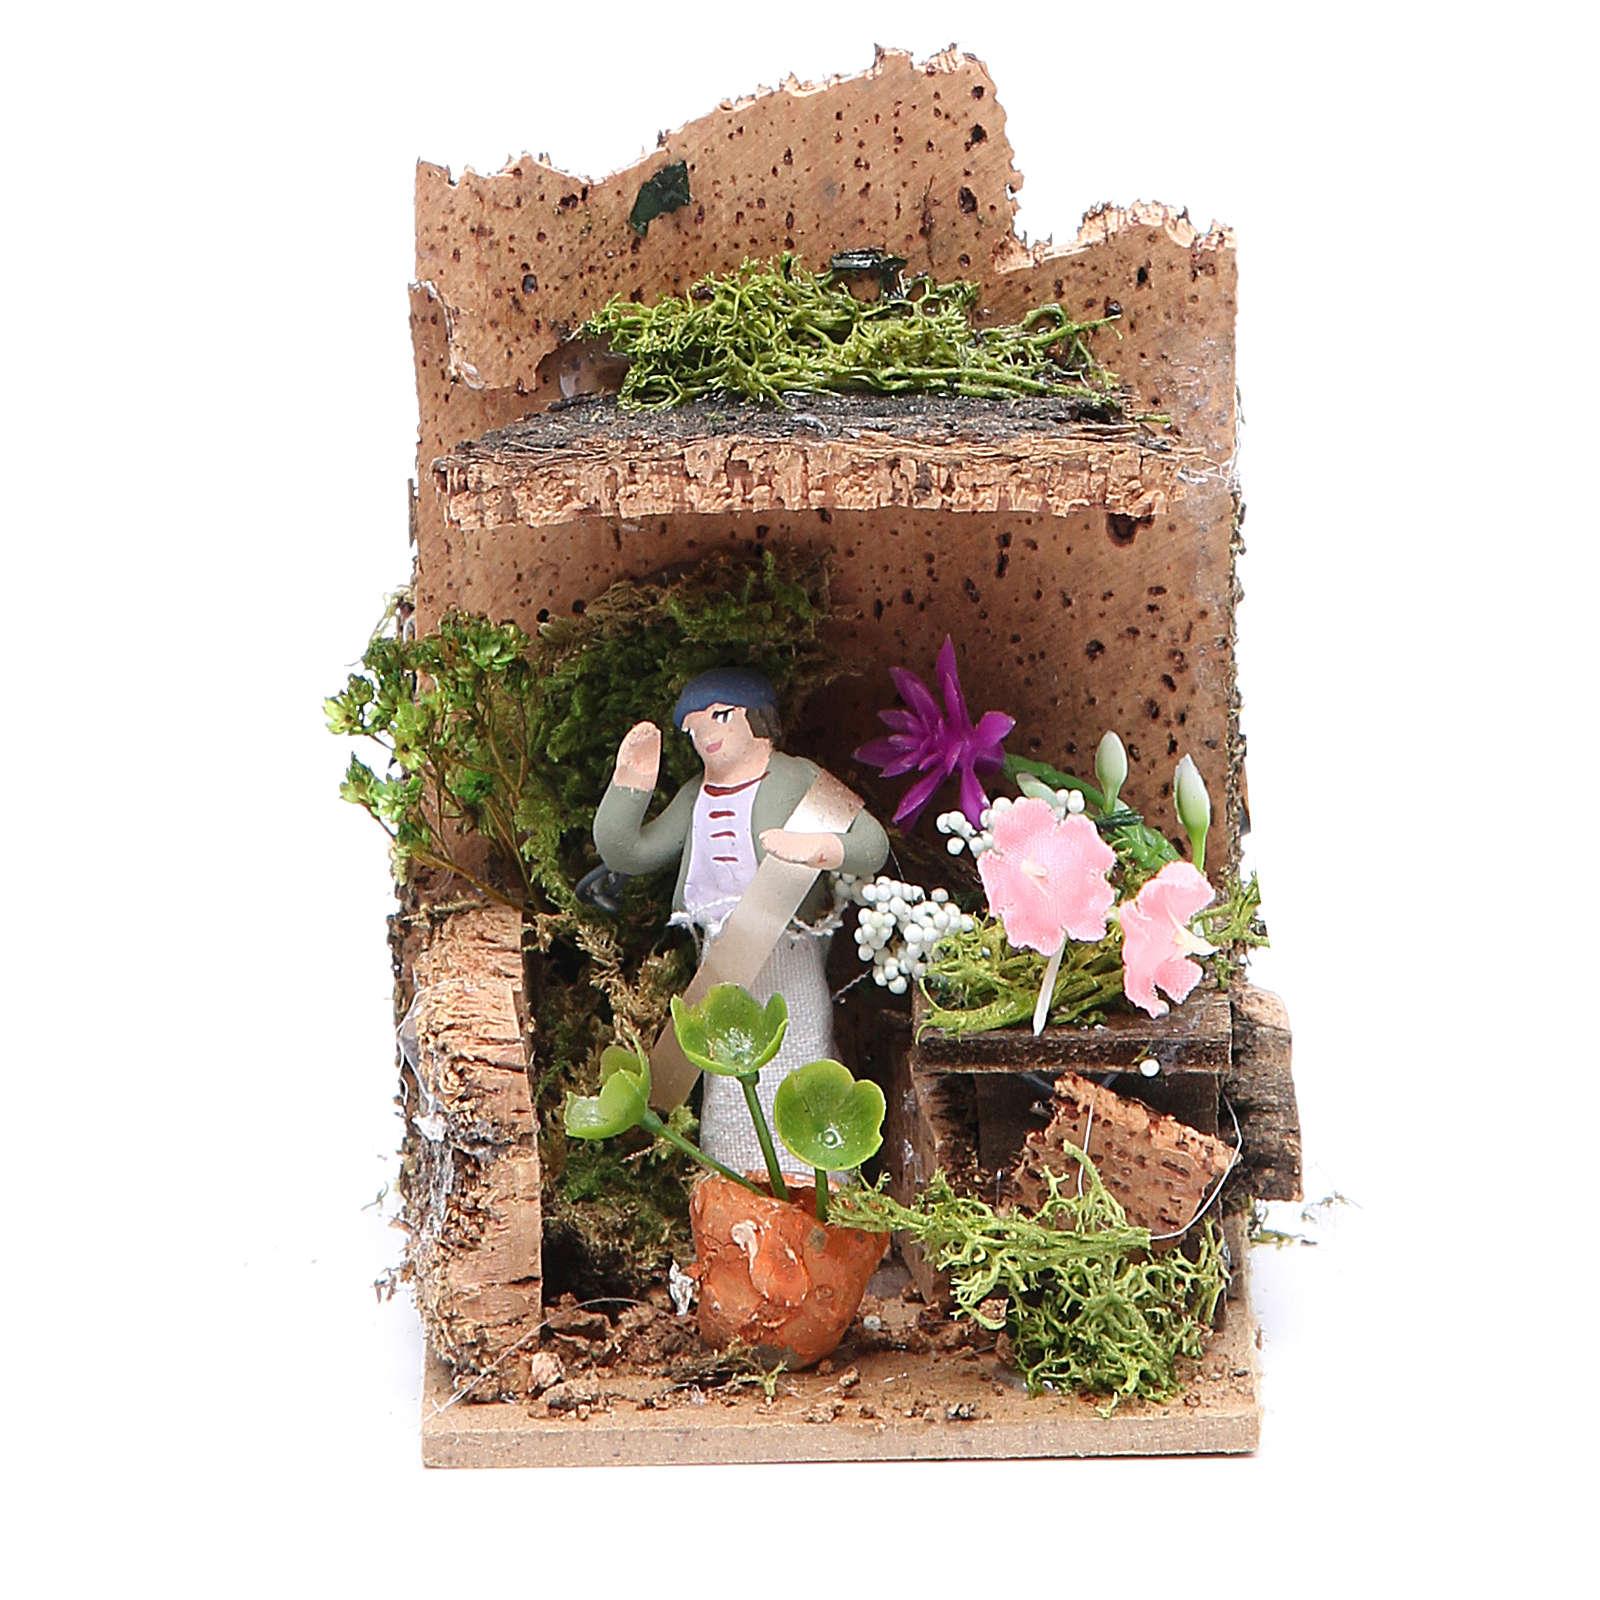 Florist measuring 4cm, animated nativity figurine 3